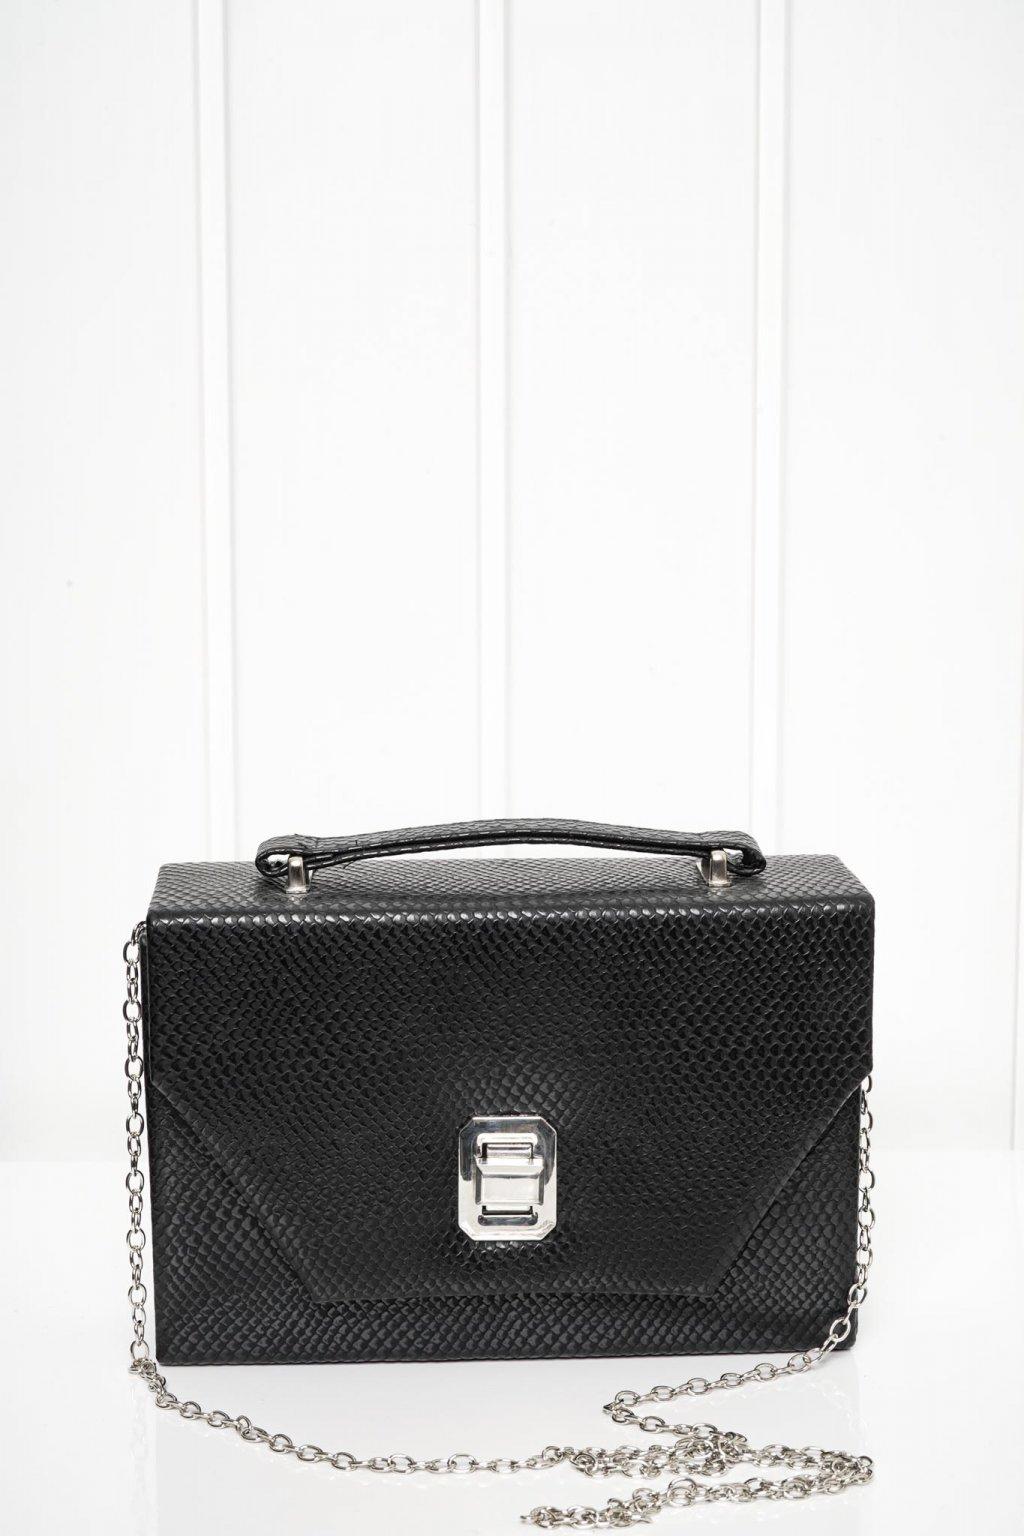 Kabelka, crossbody, ruksak, shopping bag, shopperka, 230